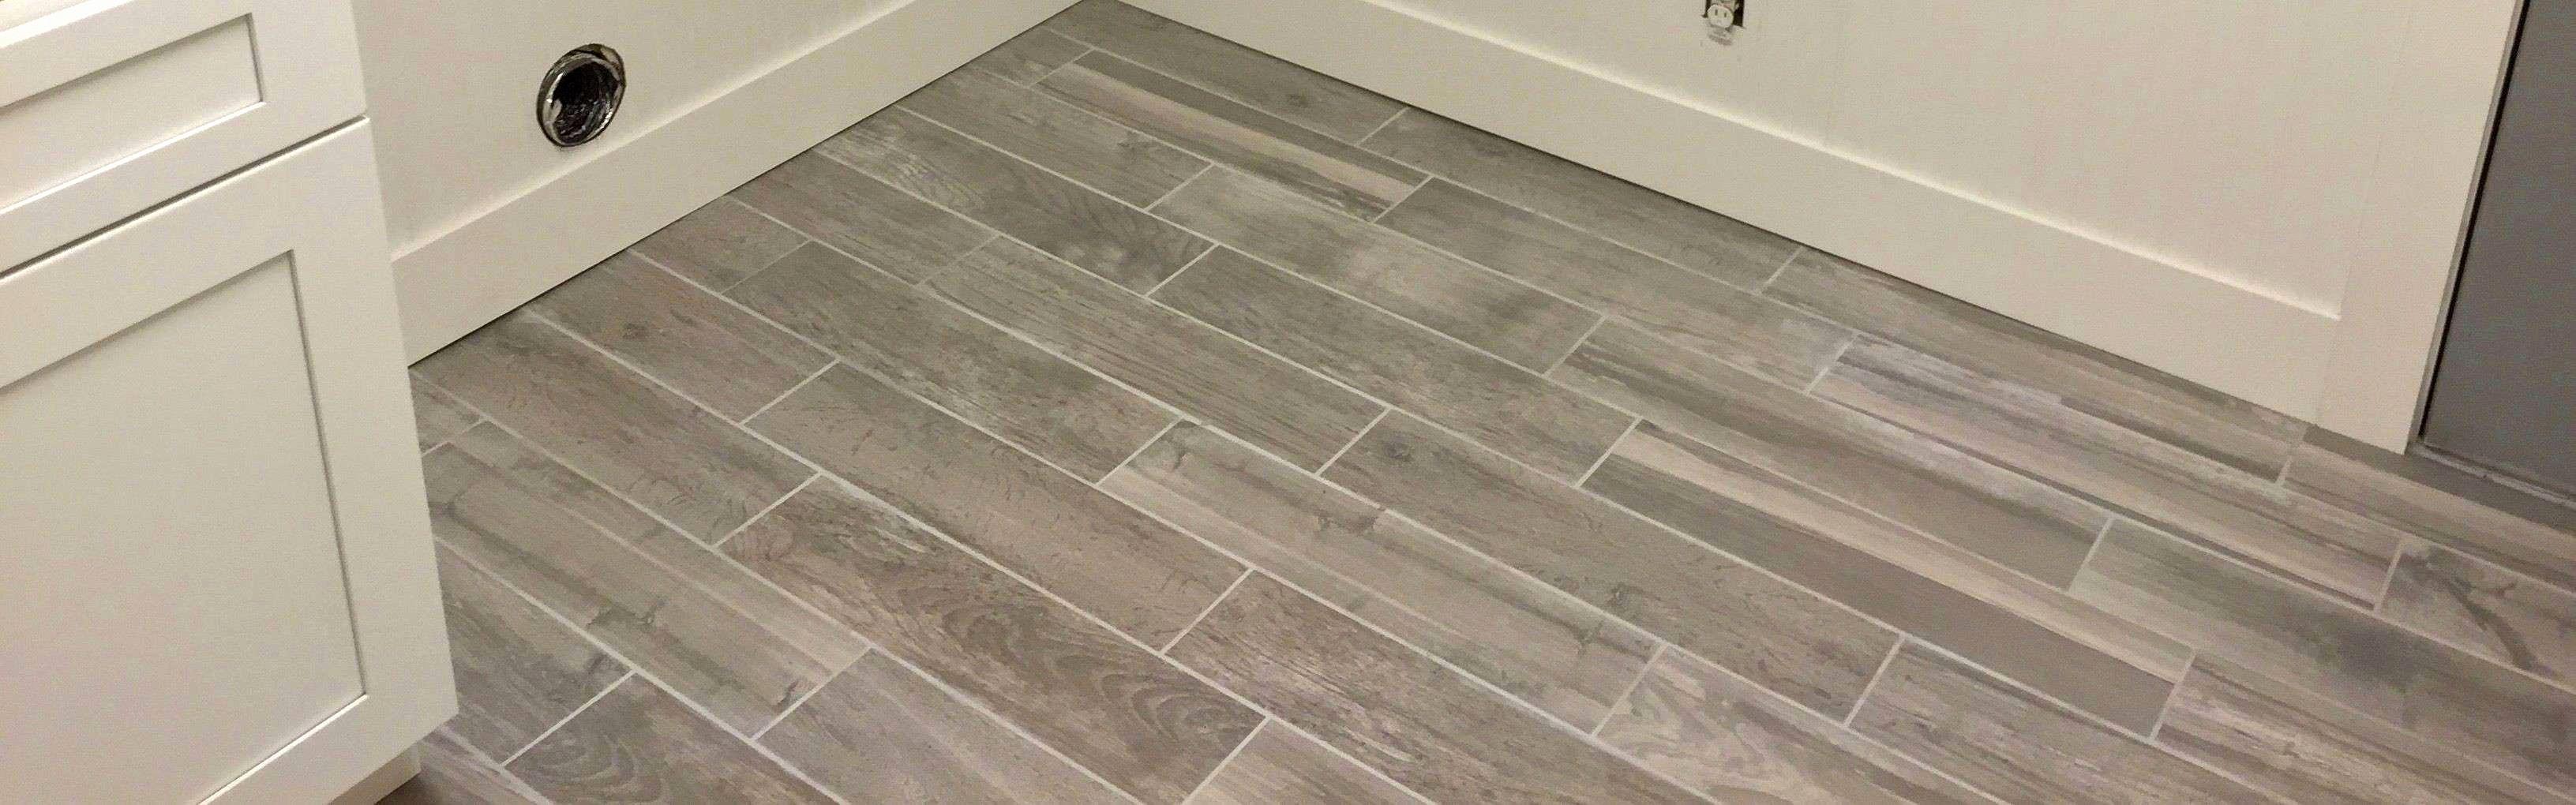 hardwood floor cleaning atlanta of 17 elegant how to get wax off hardwood floor pics dizpos com within how to get wax off hardwood floor new 50 inspirational sanding and refinishing hardwood floors graphics